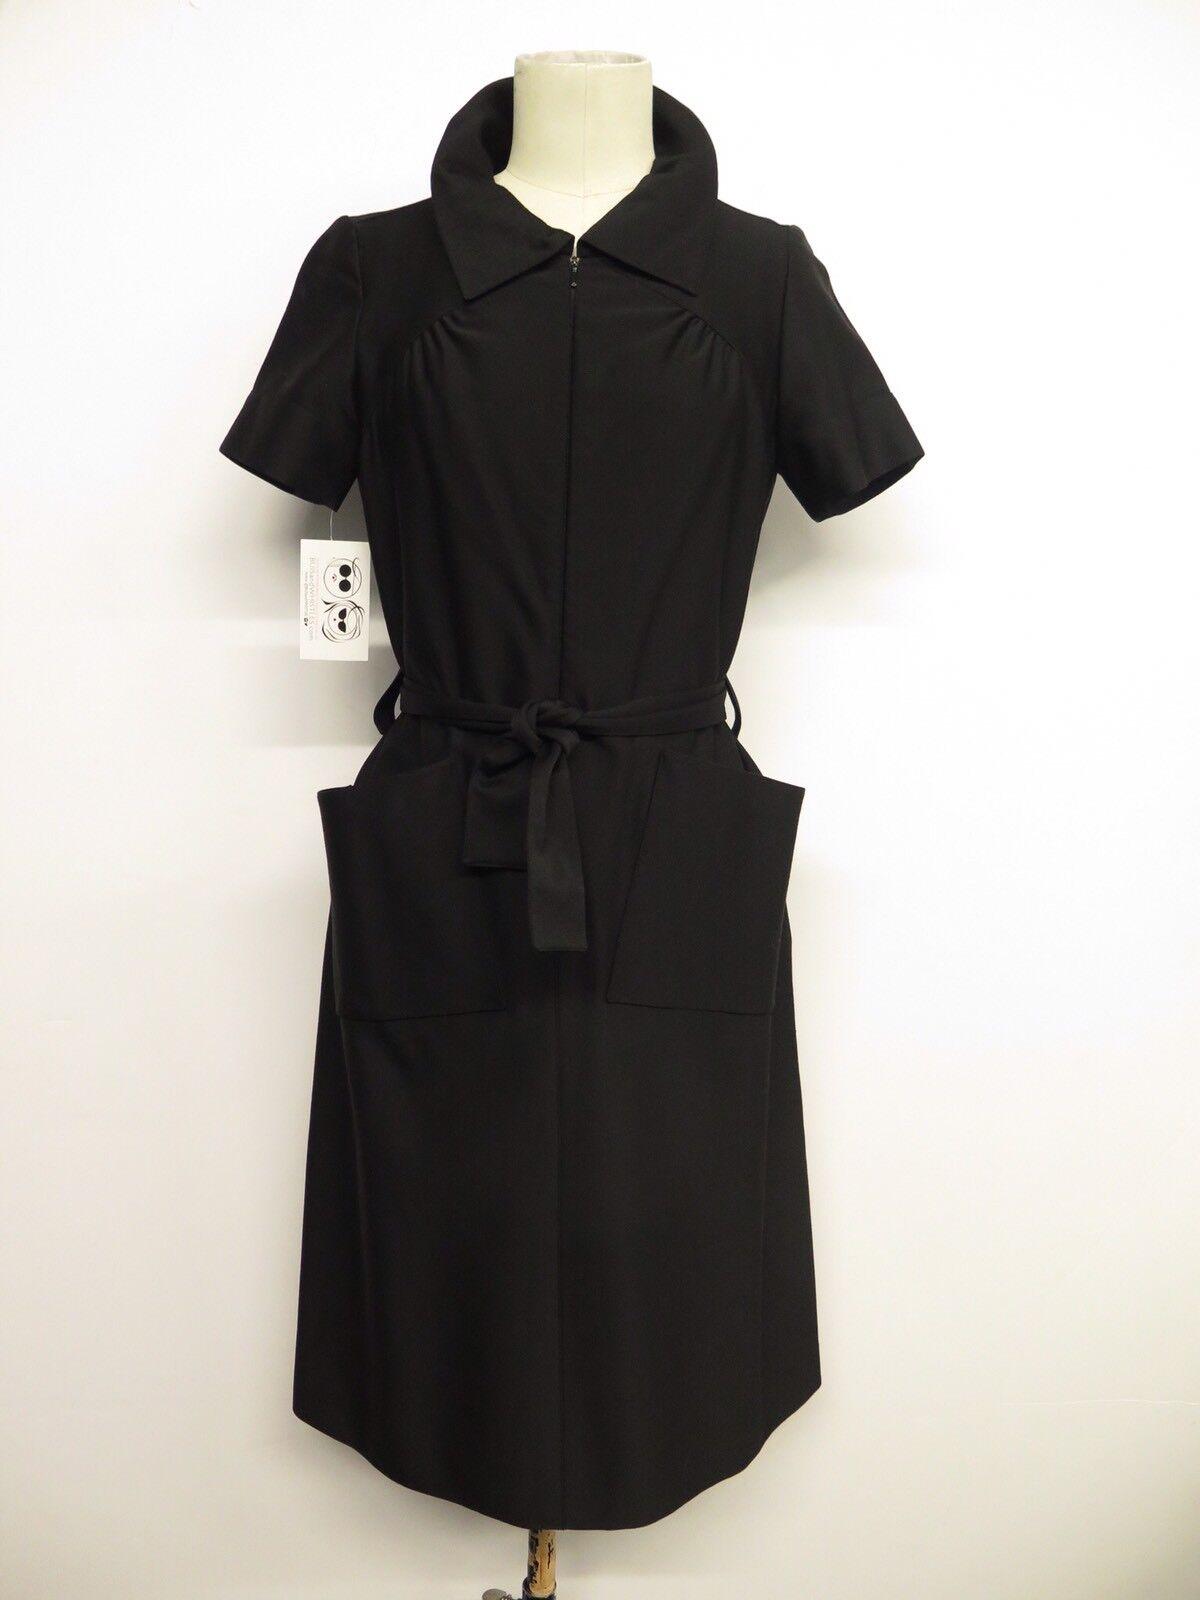 Vintage Courreges Couture Future Zip Front Belted Shift Dress Sz S